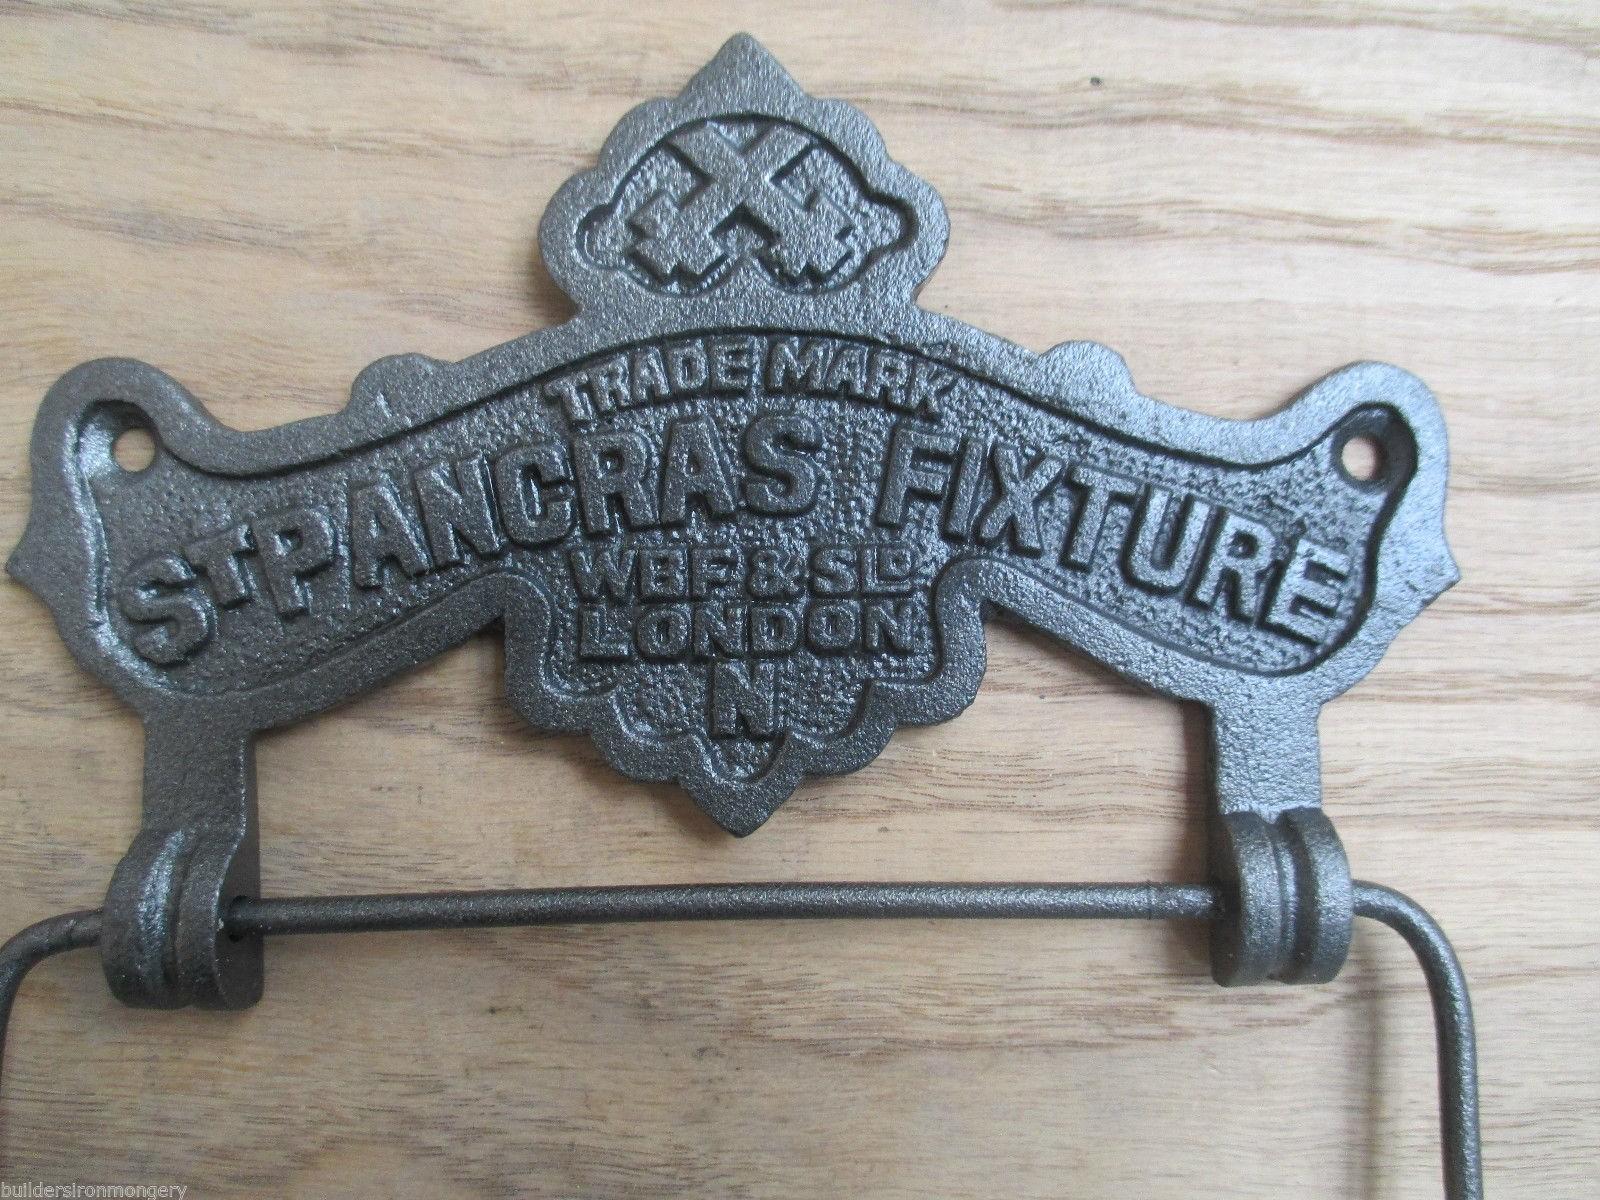 St Pancras Vintage Victorian Cast Iron Rustic Bathroom